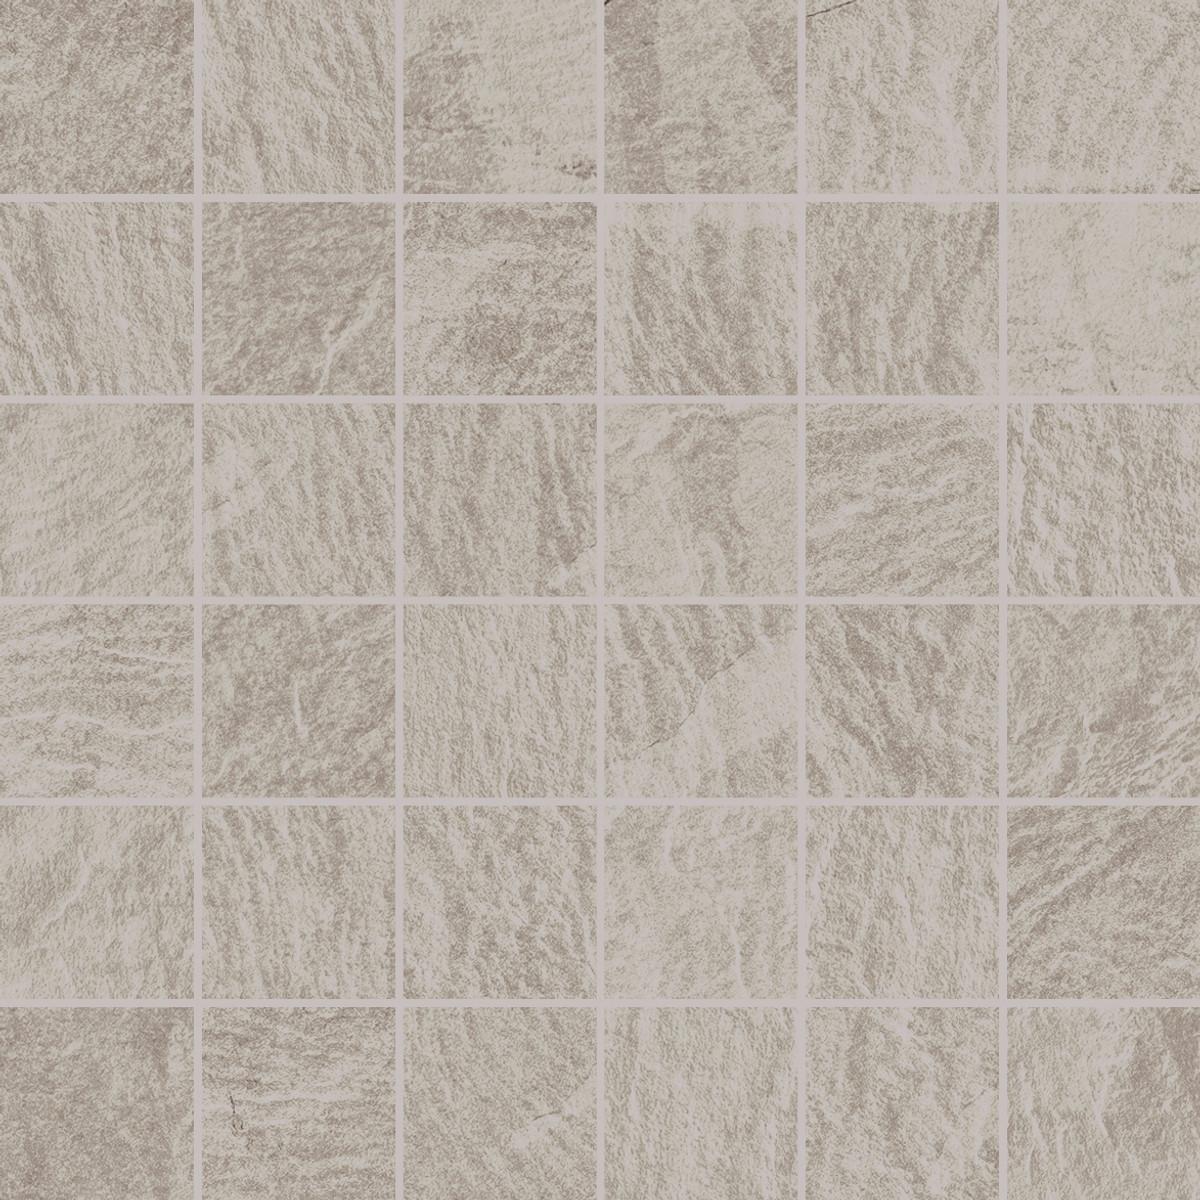 Mosaik Gazzini Slide white Mosaik 5 x 5 cm